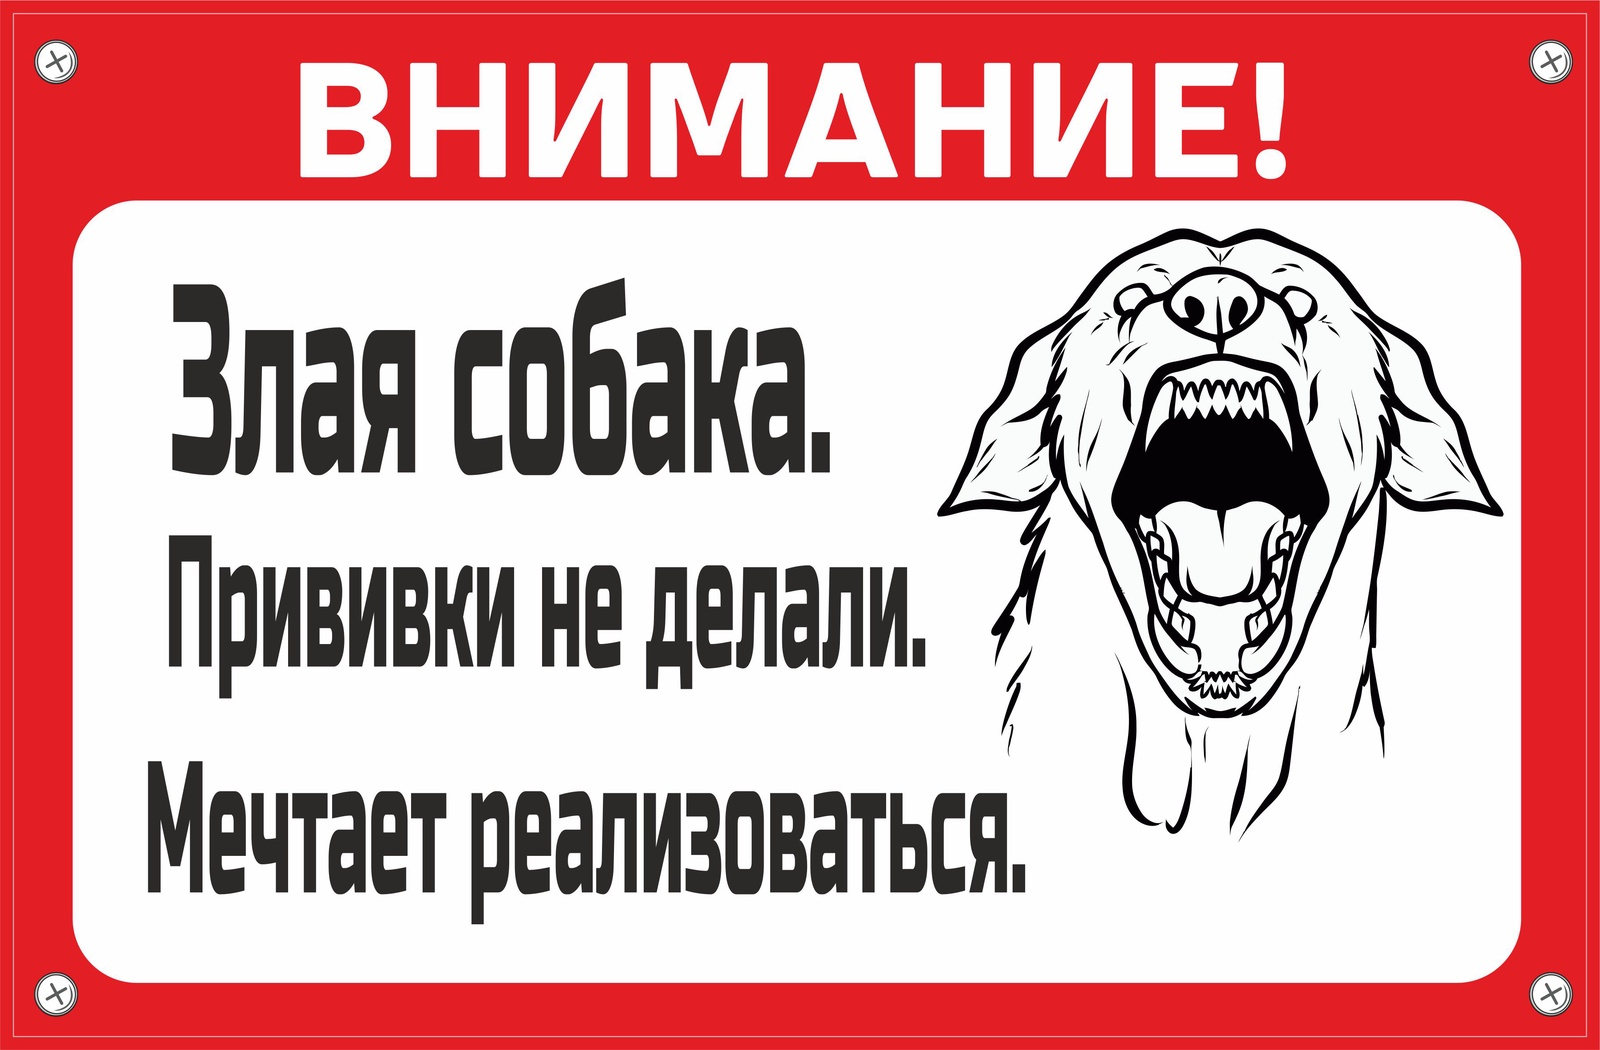 Табличка Mashinokom Собака мечтает TPS 003, белый, красный, 30*19,5 см табличка tps 004 собака без привязи пластик 3 мм 30 19 5 см